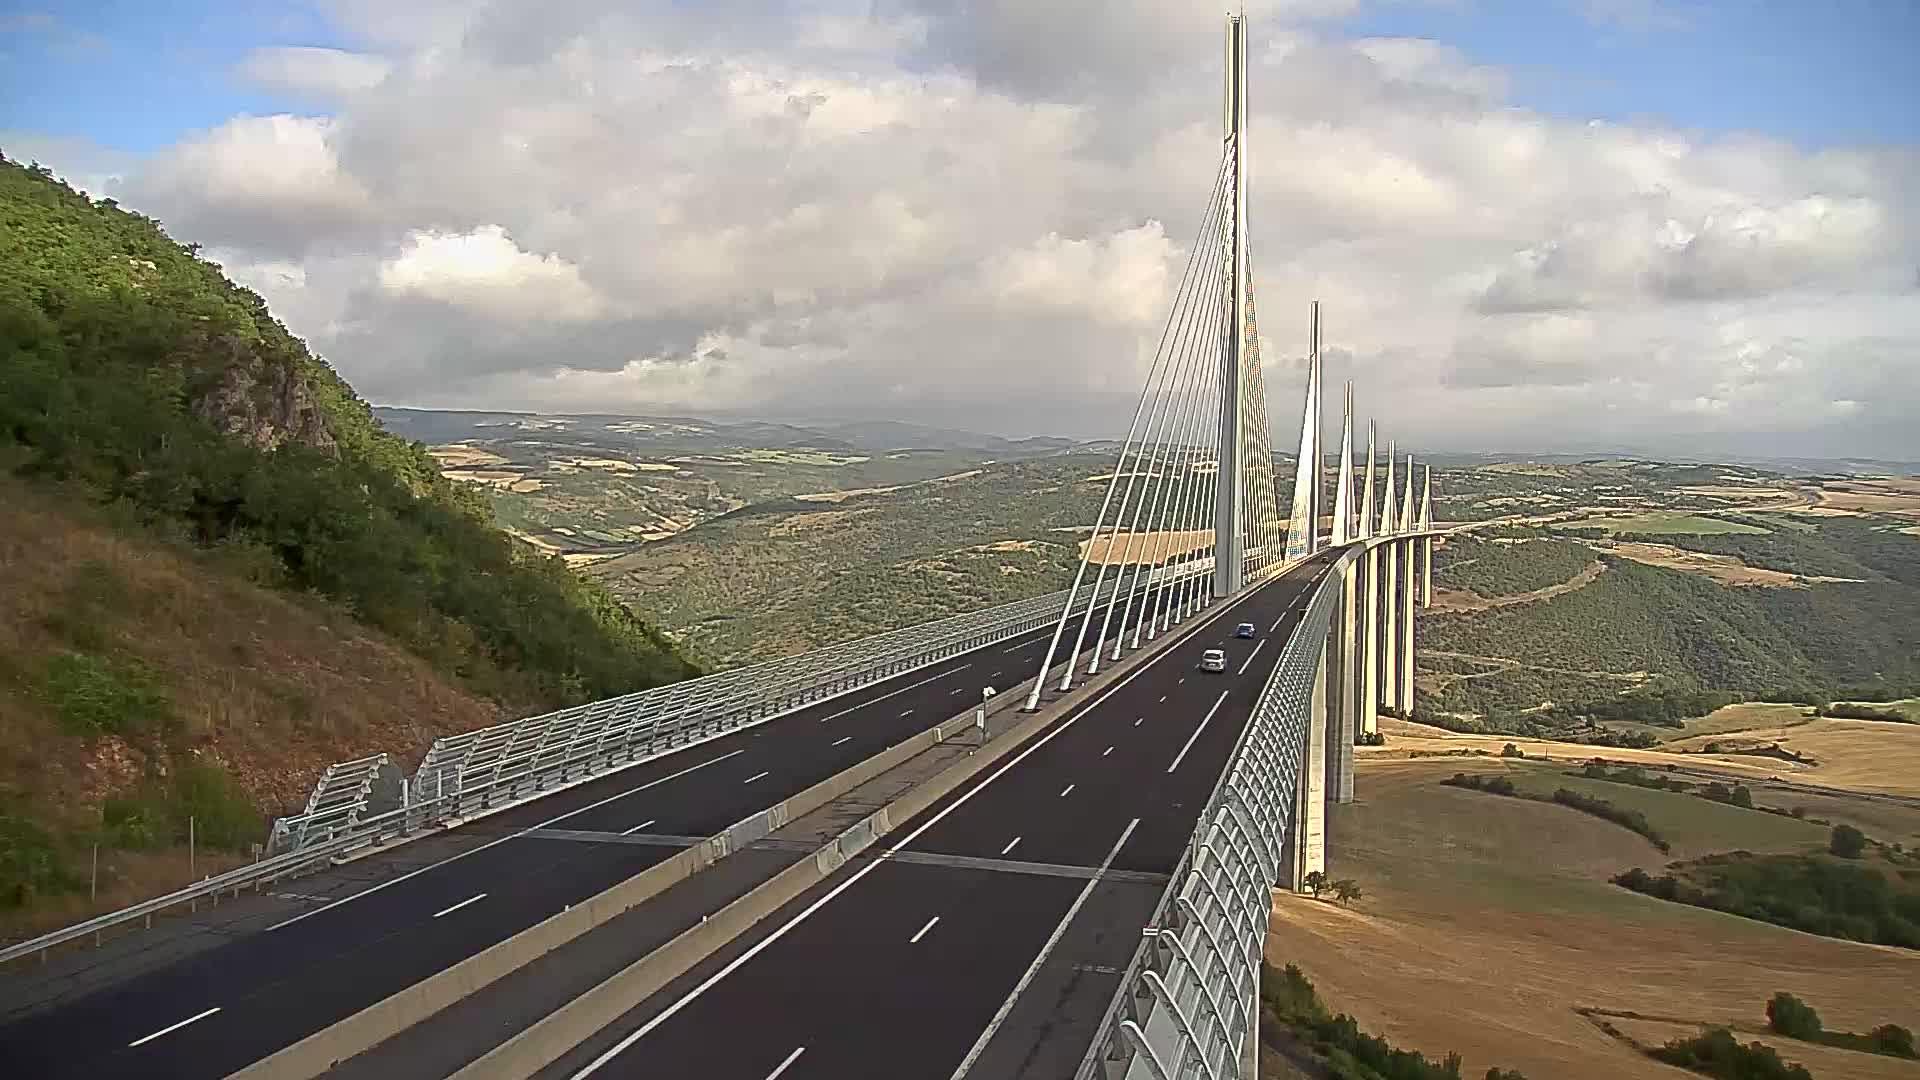 Millau Viaduct Wed. 09:49